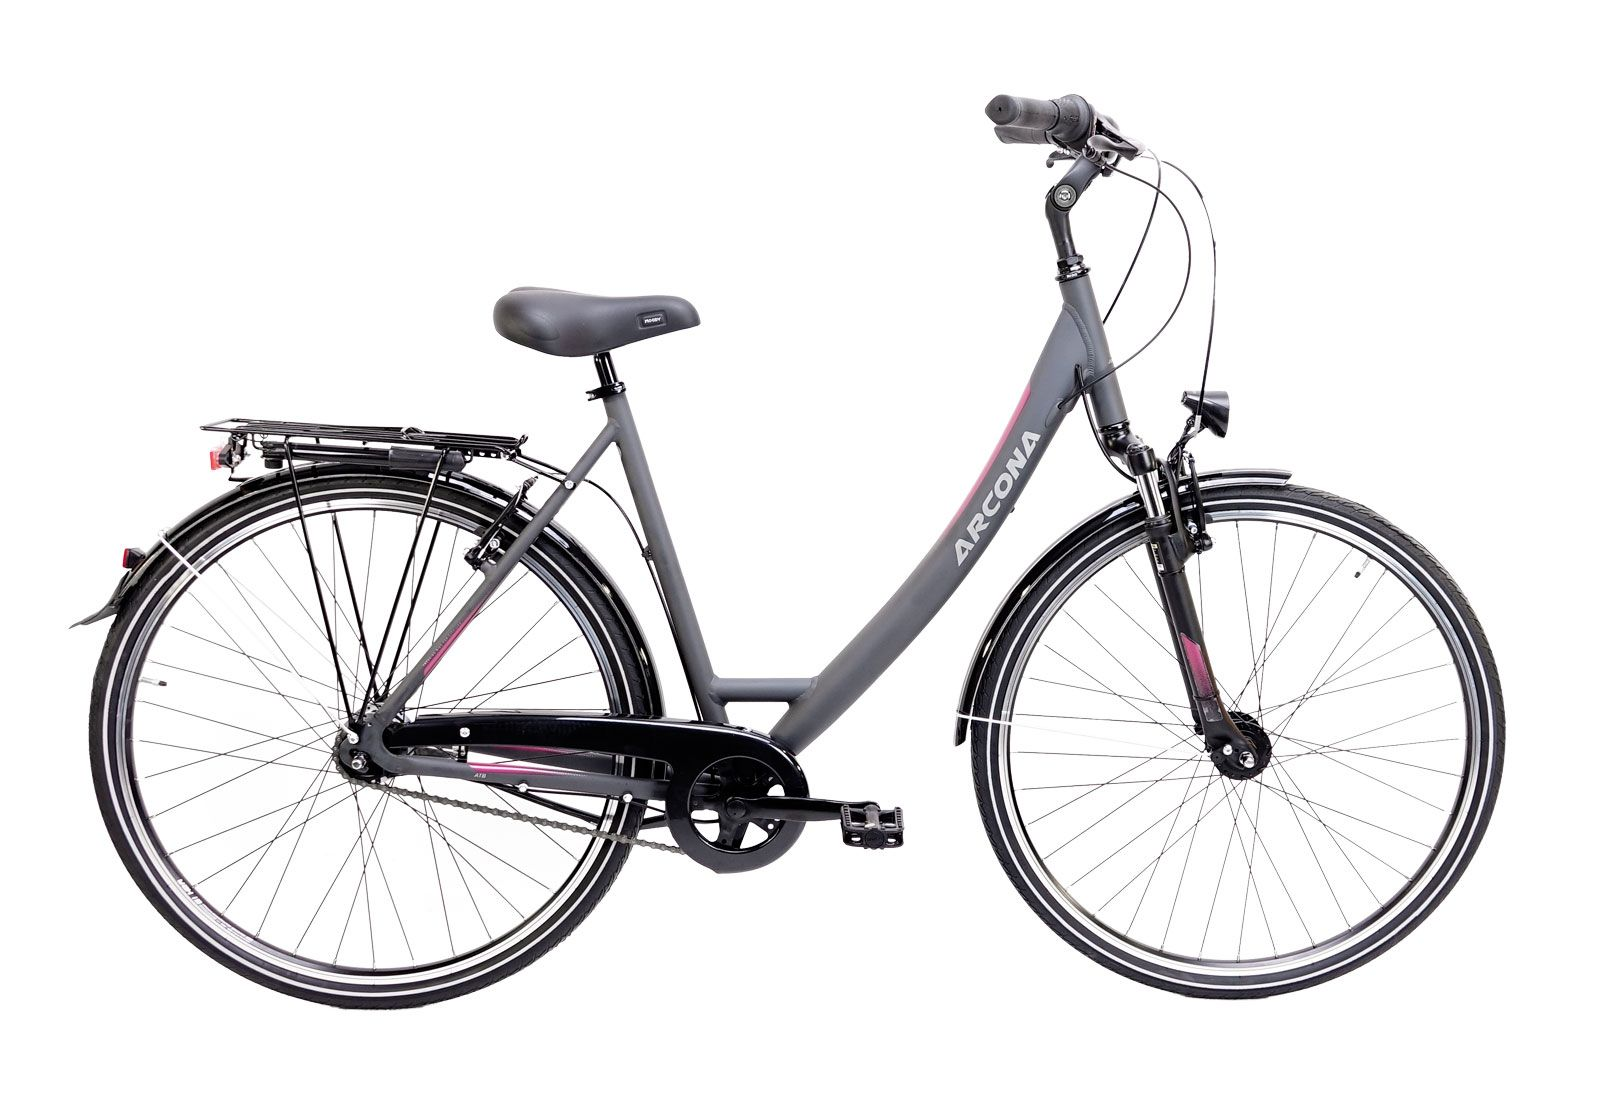 city-/tourenräder/Citybikes: ARCONA  SANTE CITY 7 Gang Nabenschaltung Damenfahrrad Wave Modell 2021 28 Zoll 55 cm raven-grey MATT